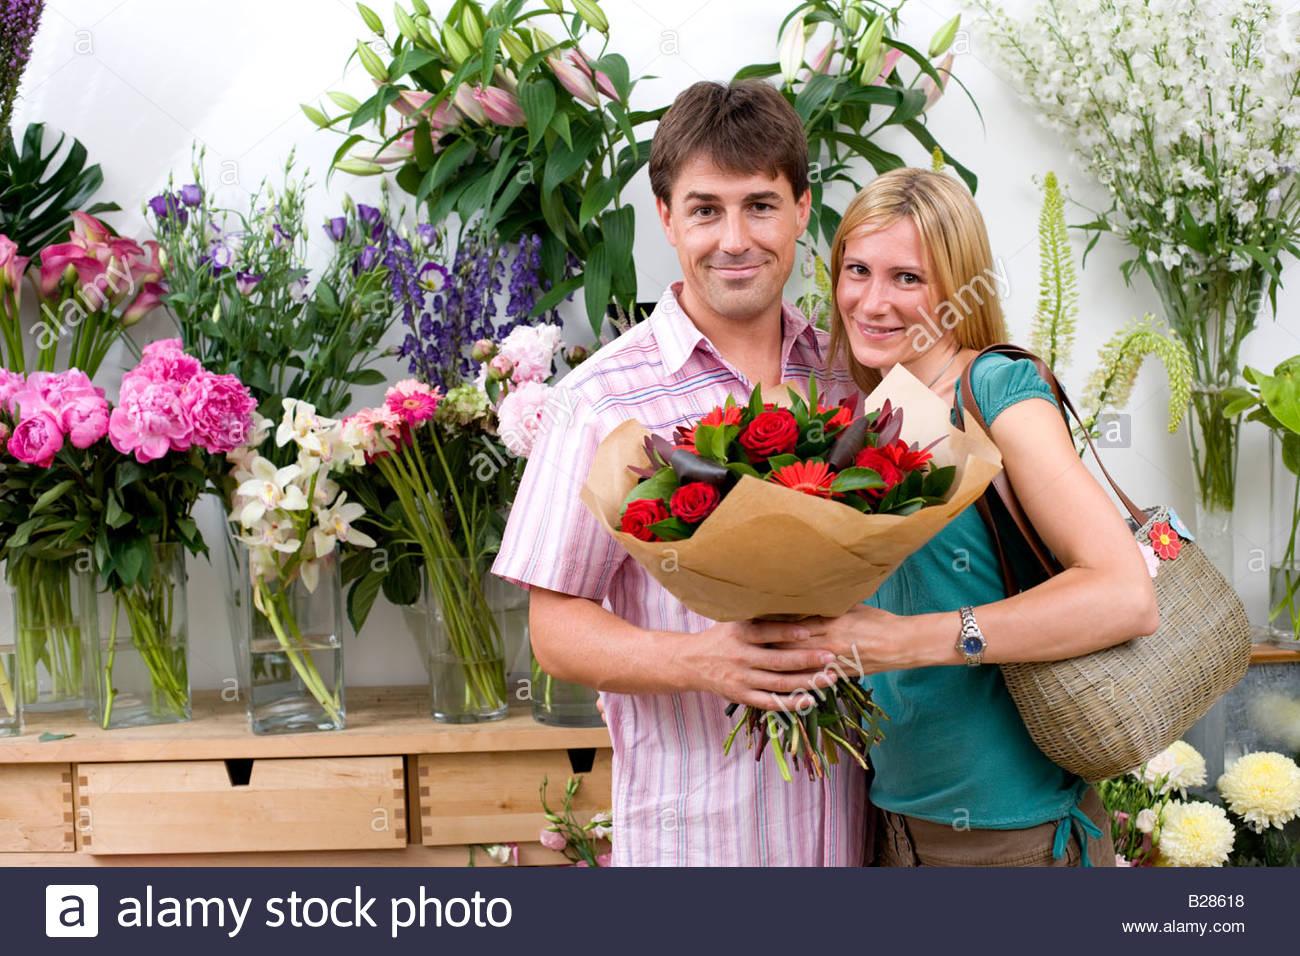 Bouquet flowers hands giving stock photos bouquet flowers hands couple with bouquet of flowers in shop smiling portrait stock image izmirmasajfo